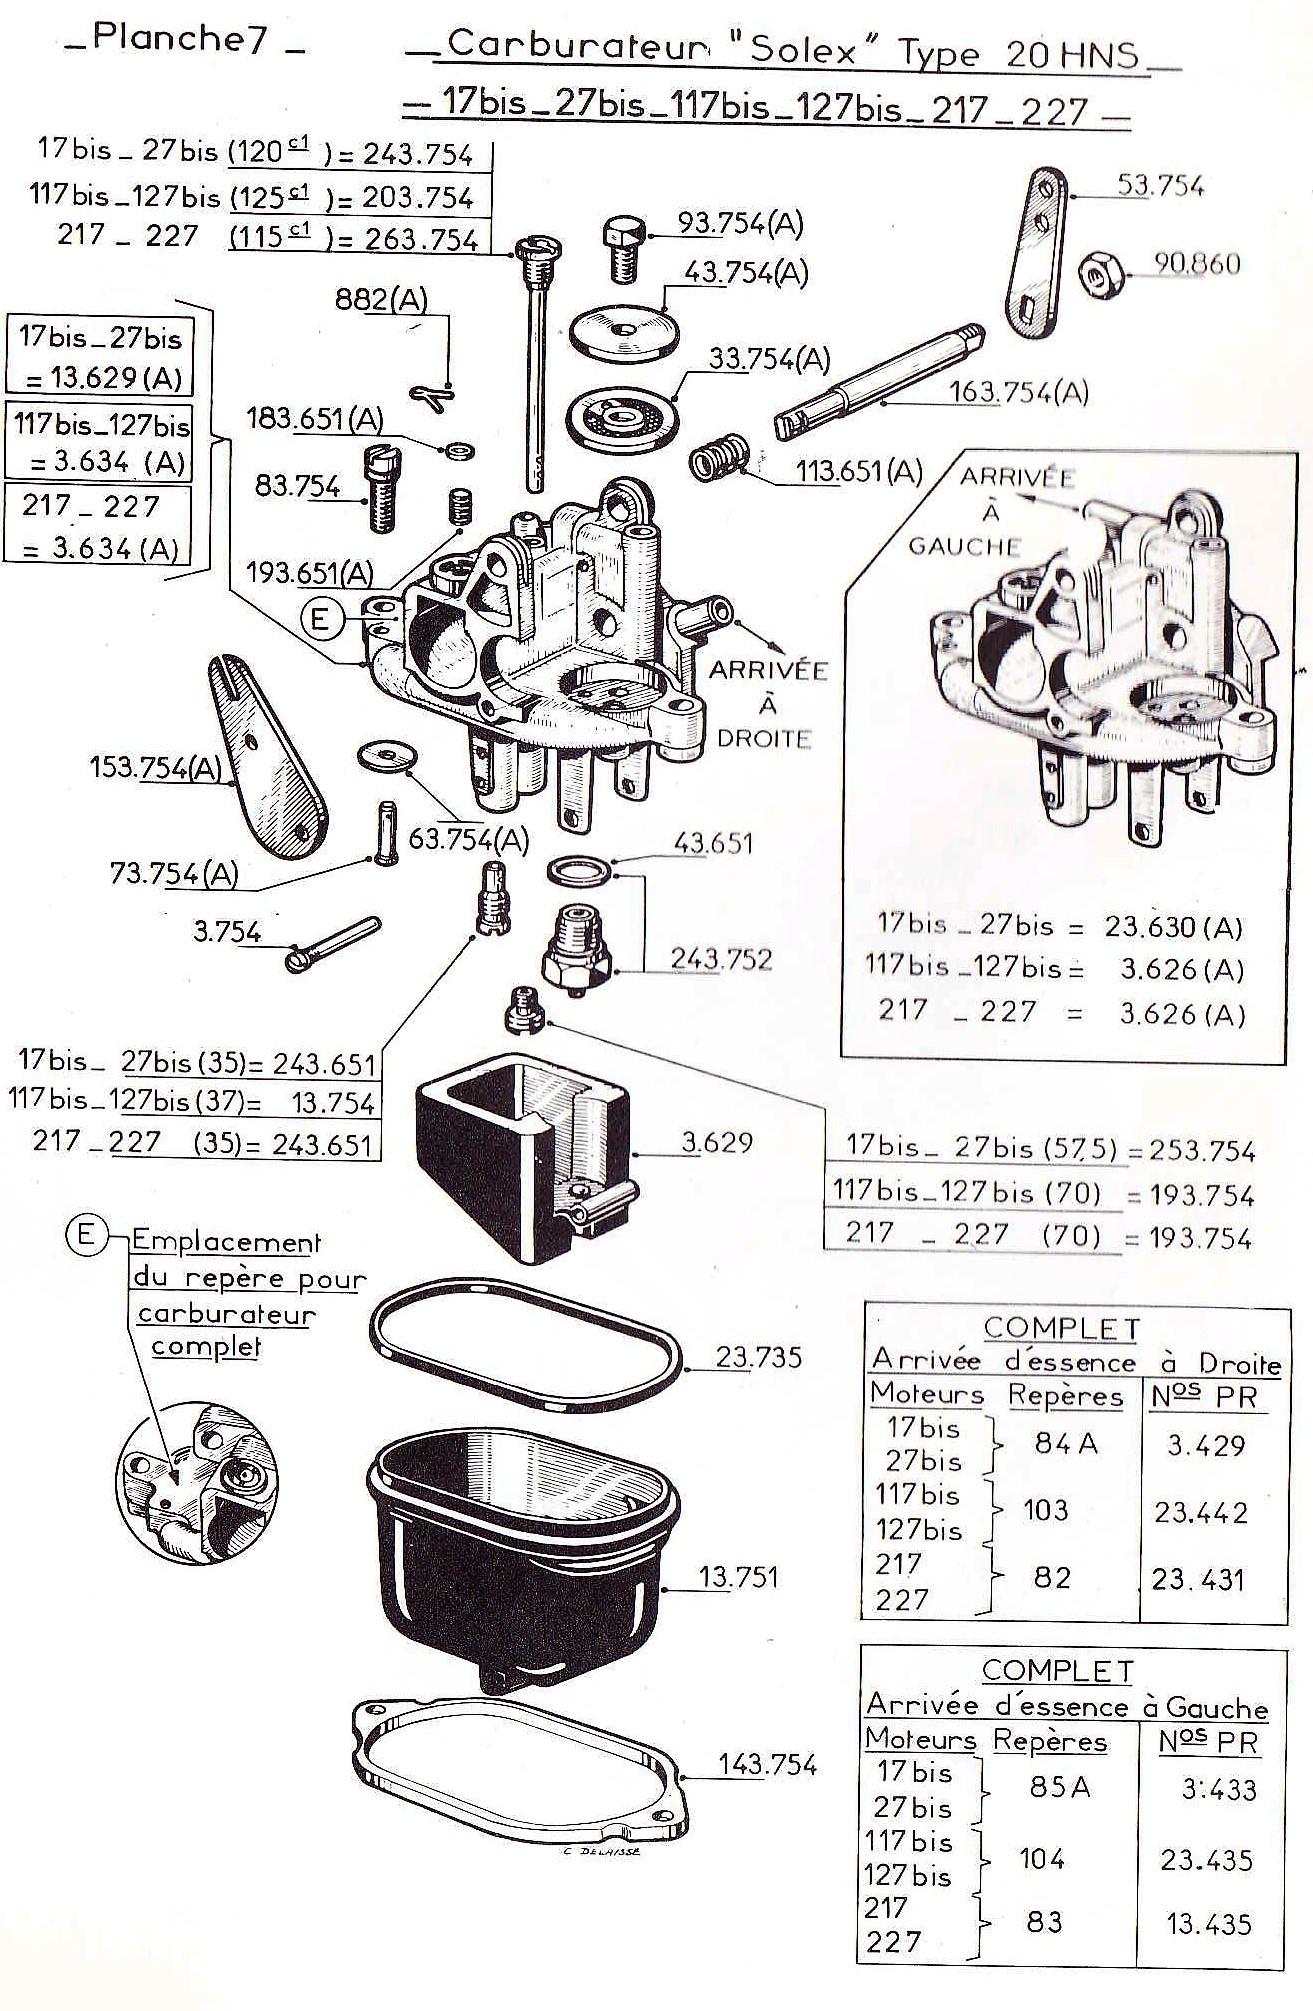 vue éclatée carburateur W17b-W117b